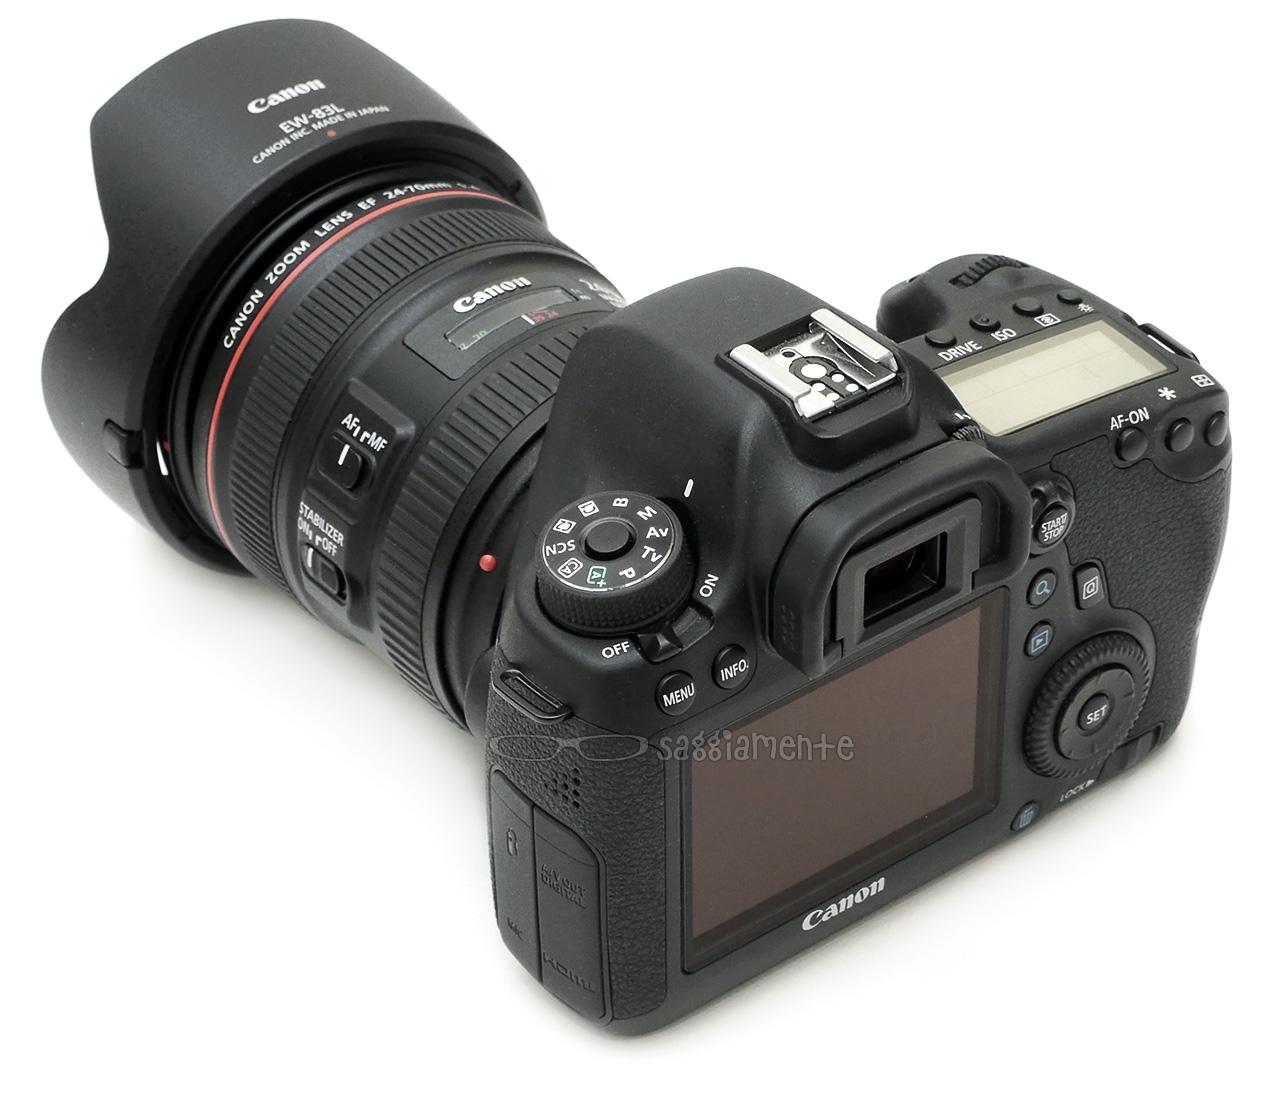 6D-top-dx-retro